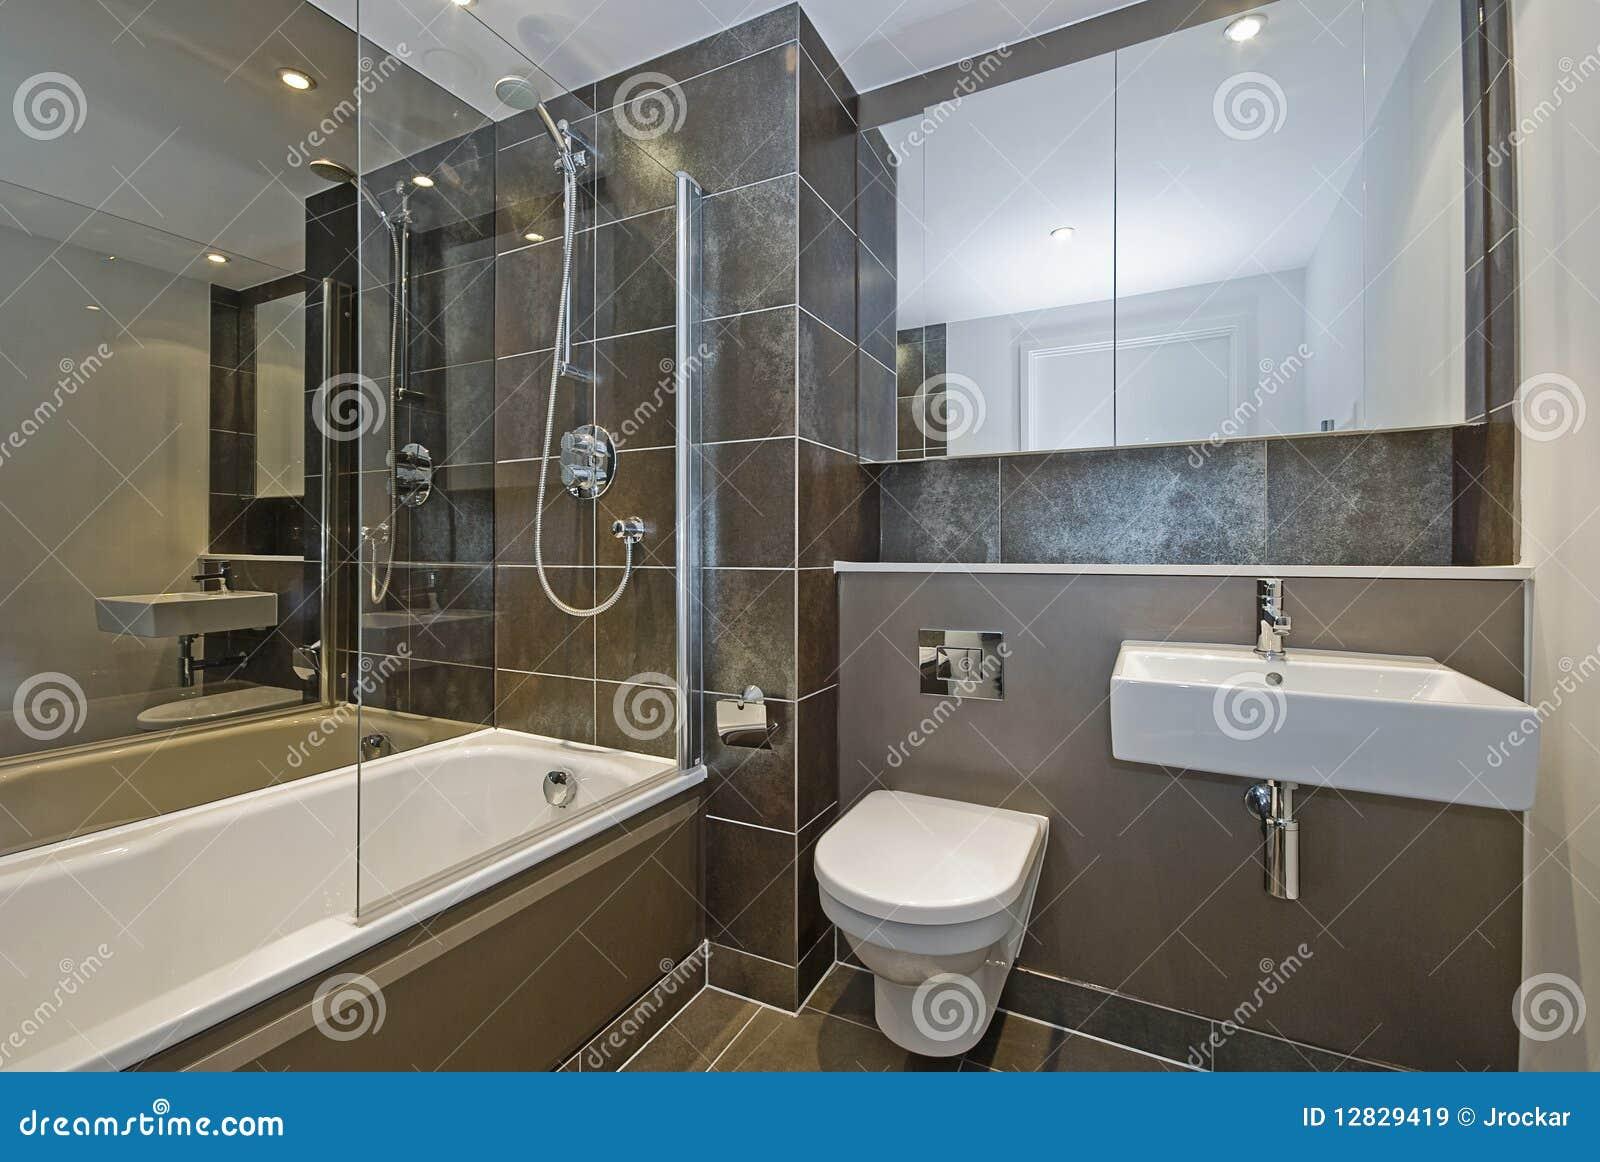 Salle de bains de luxe images libres de droits image - Salle de bain de luxe photo ...